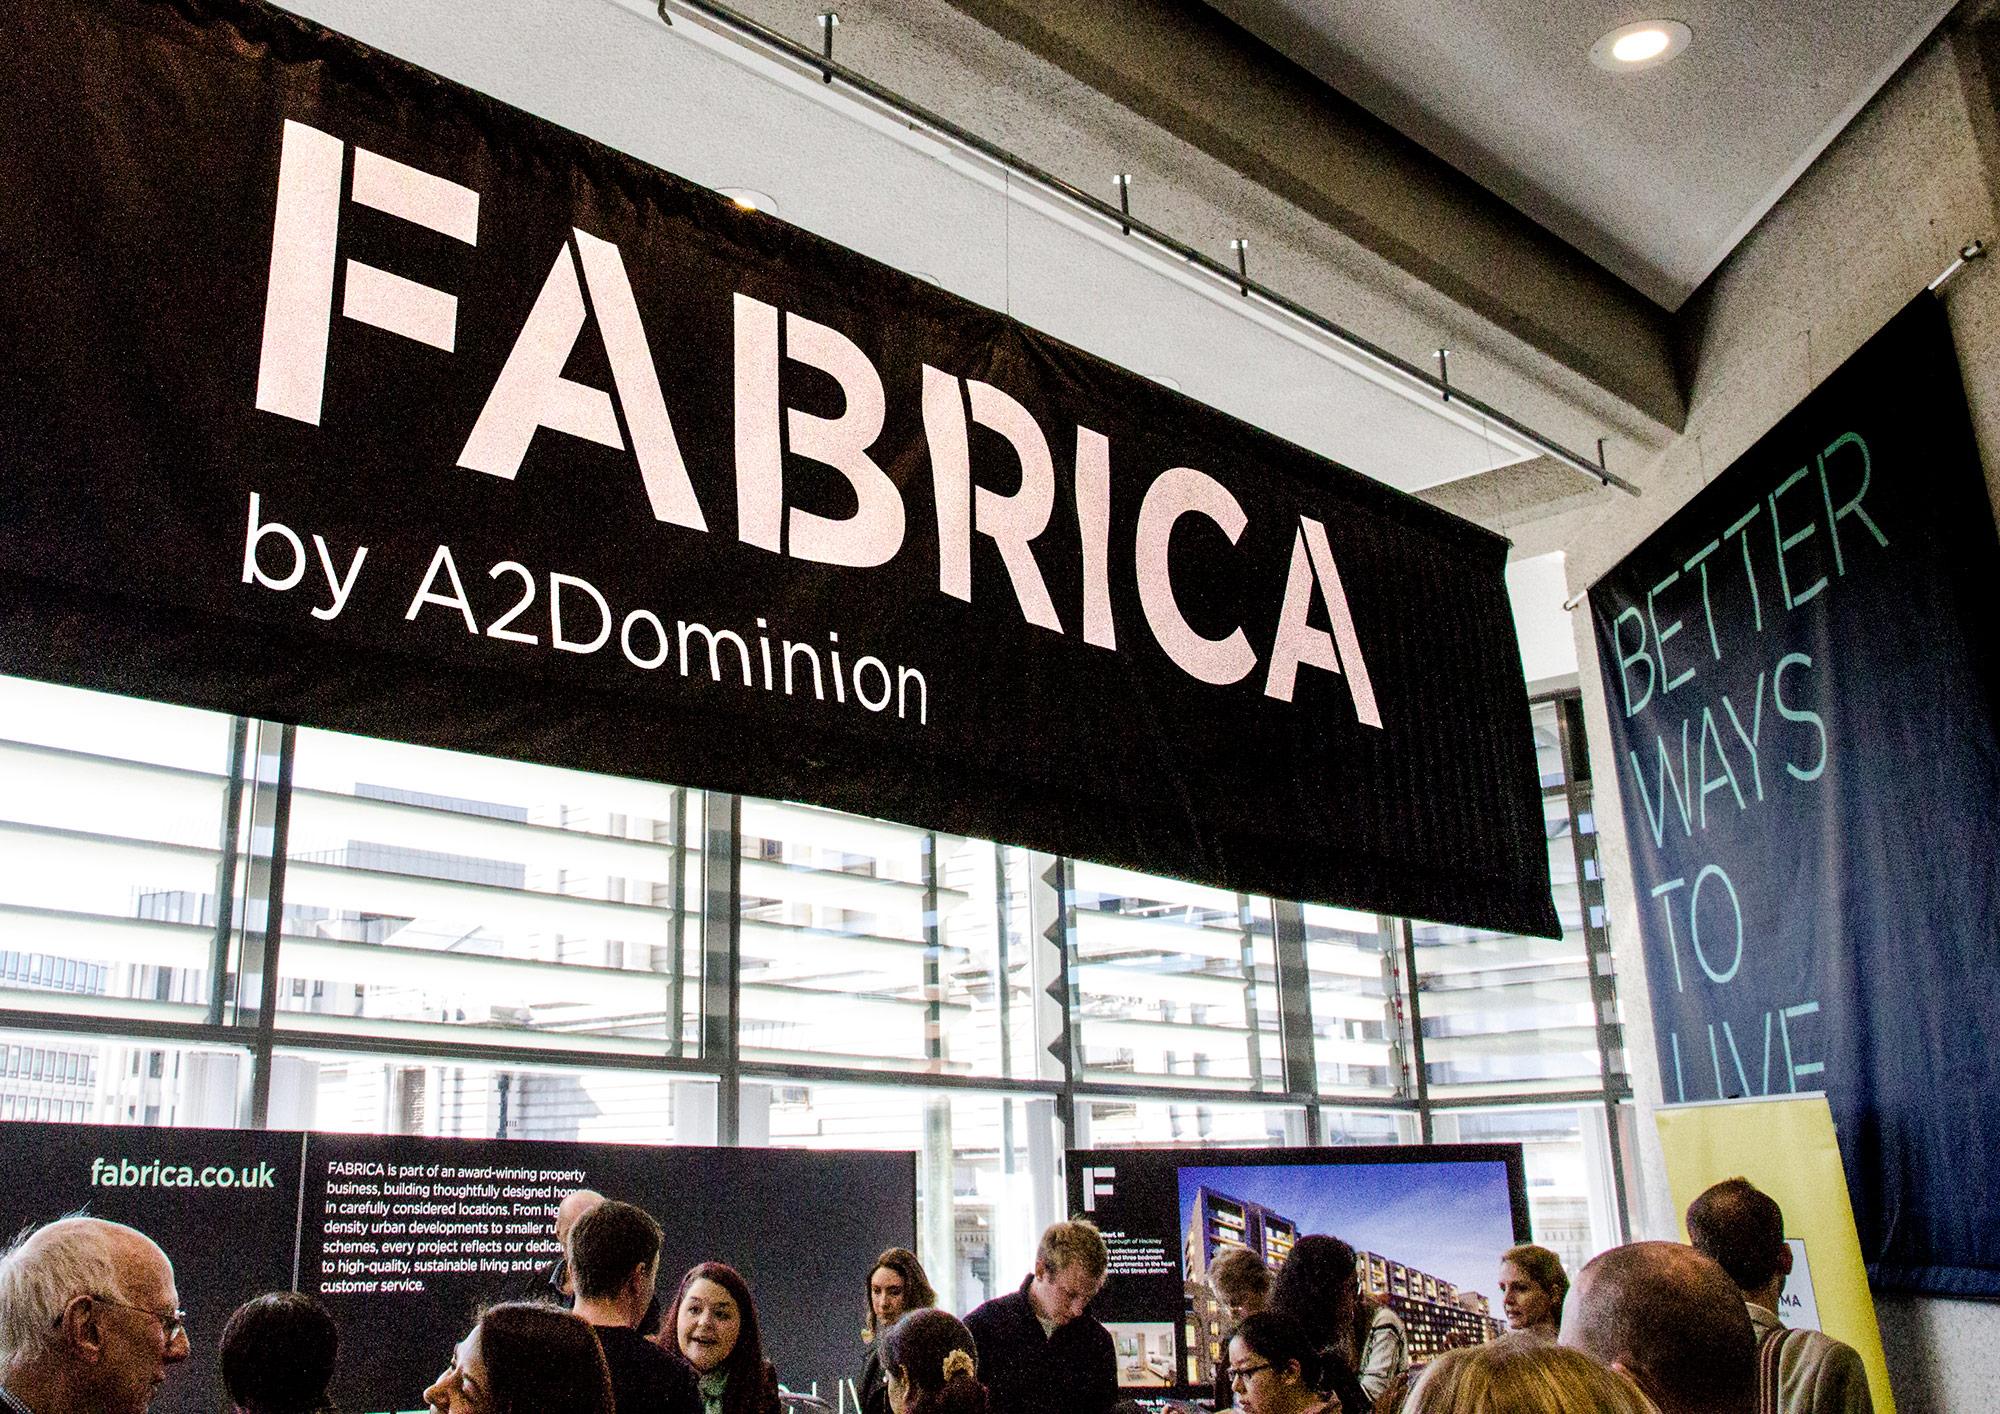 FABRICA brand event